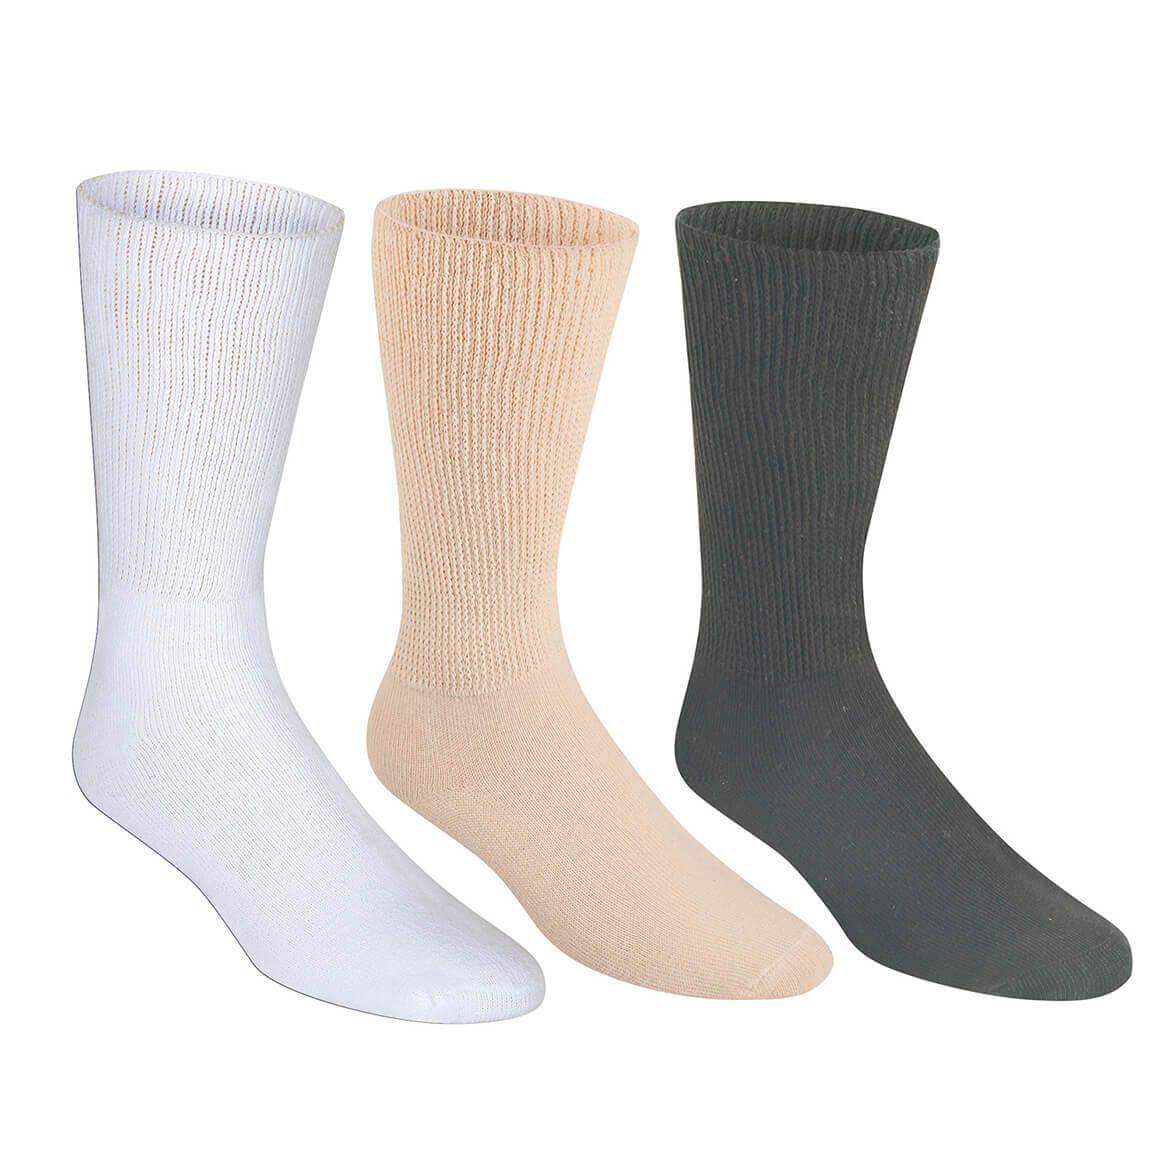 Ultimate Diabetic Socks 3 Pairs-370015